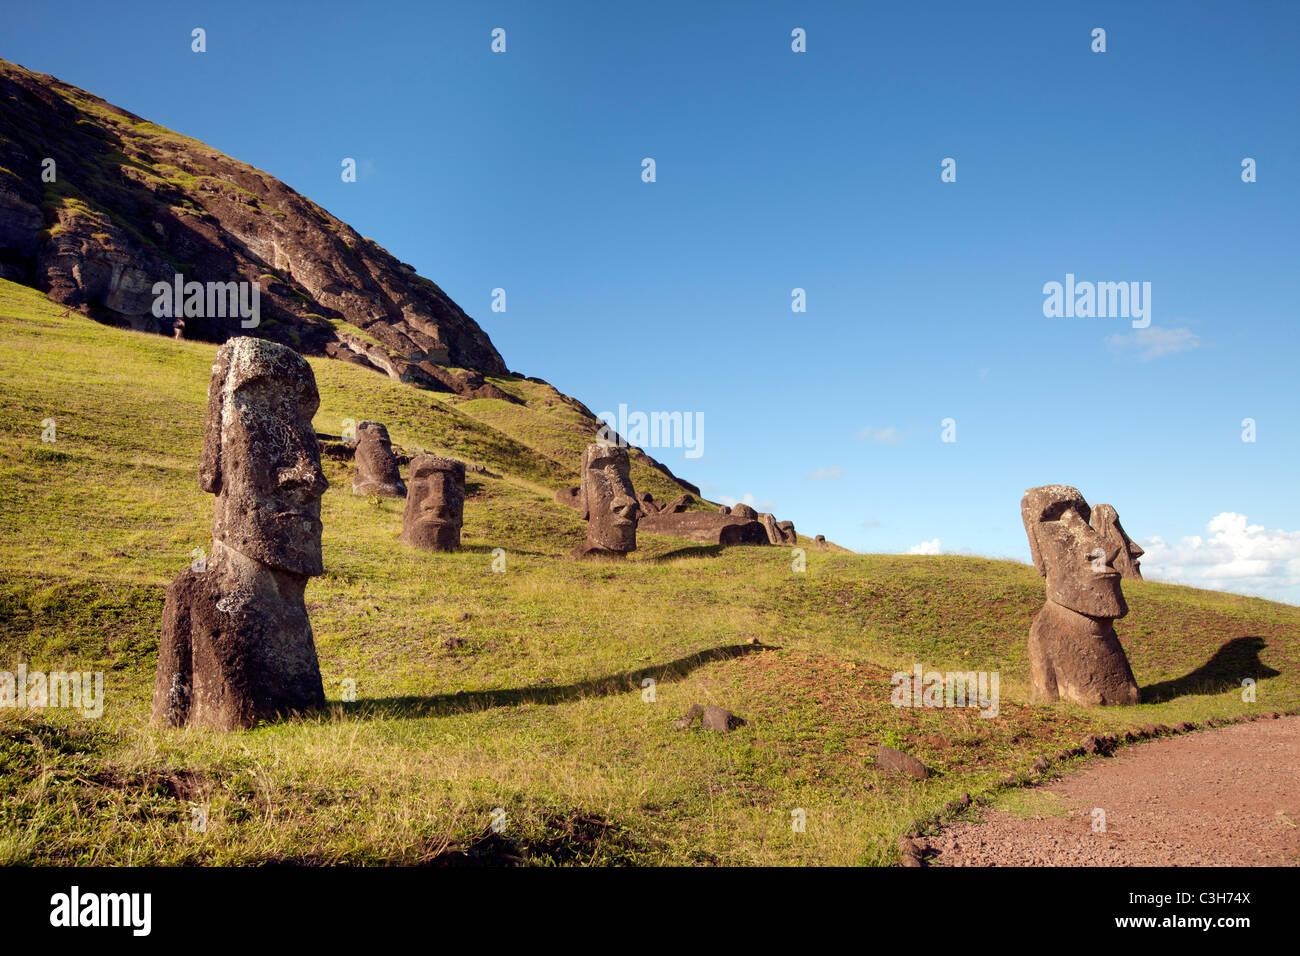 Moais on hillside at Rano Raraku, Easter Island. - Stock Image